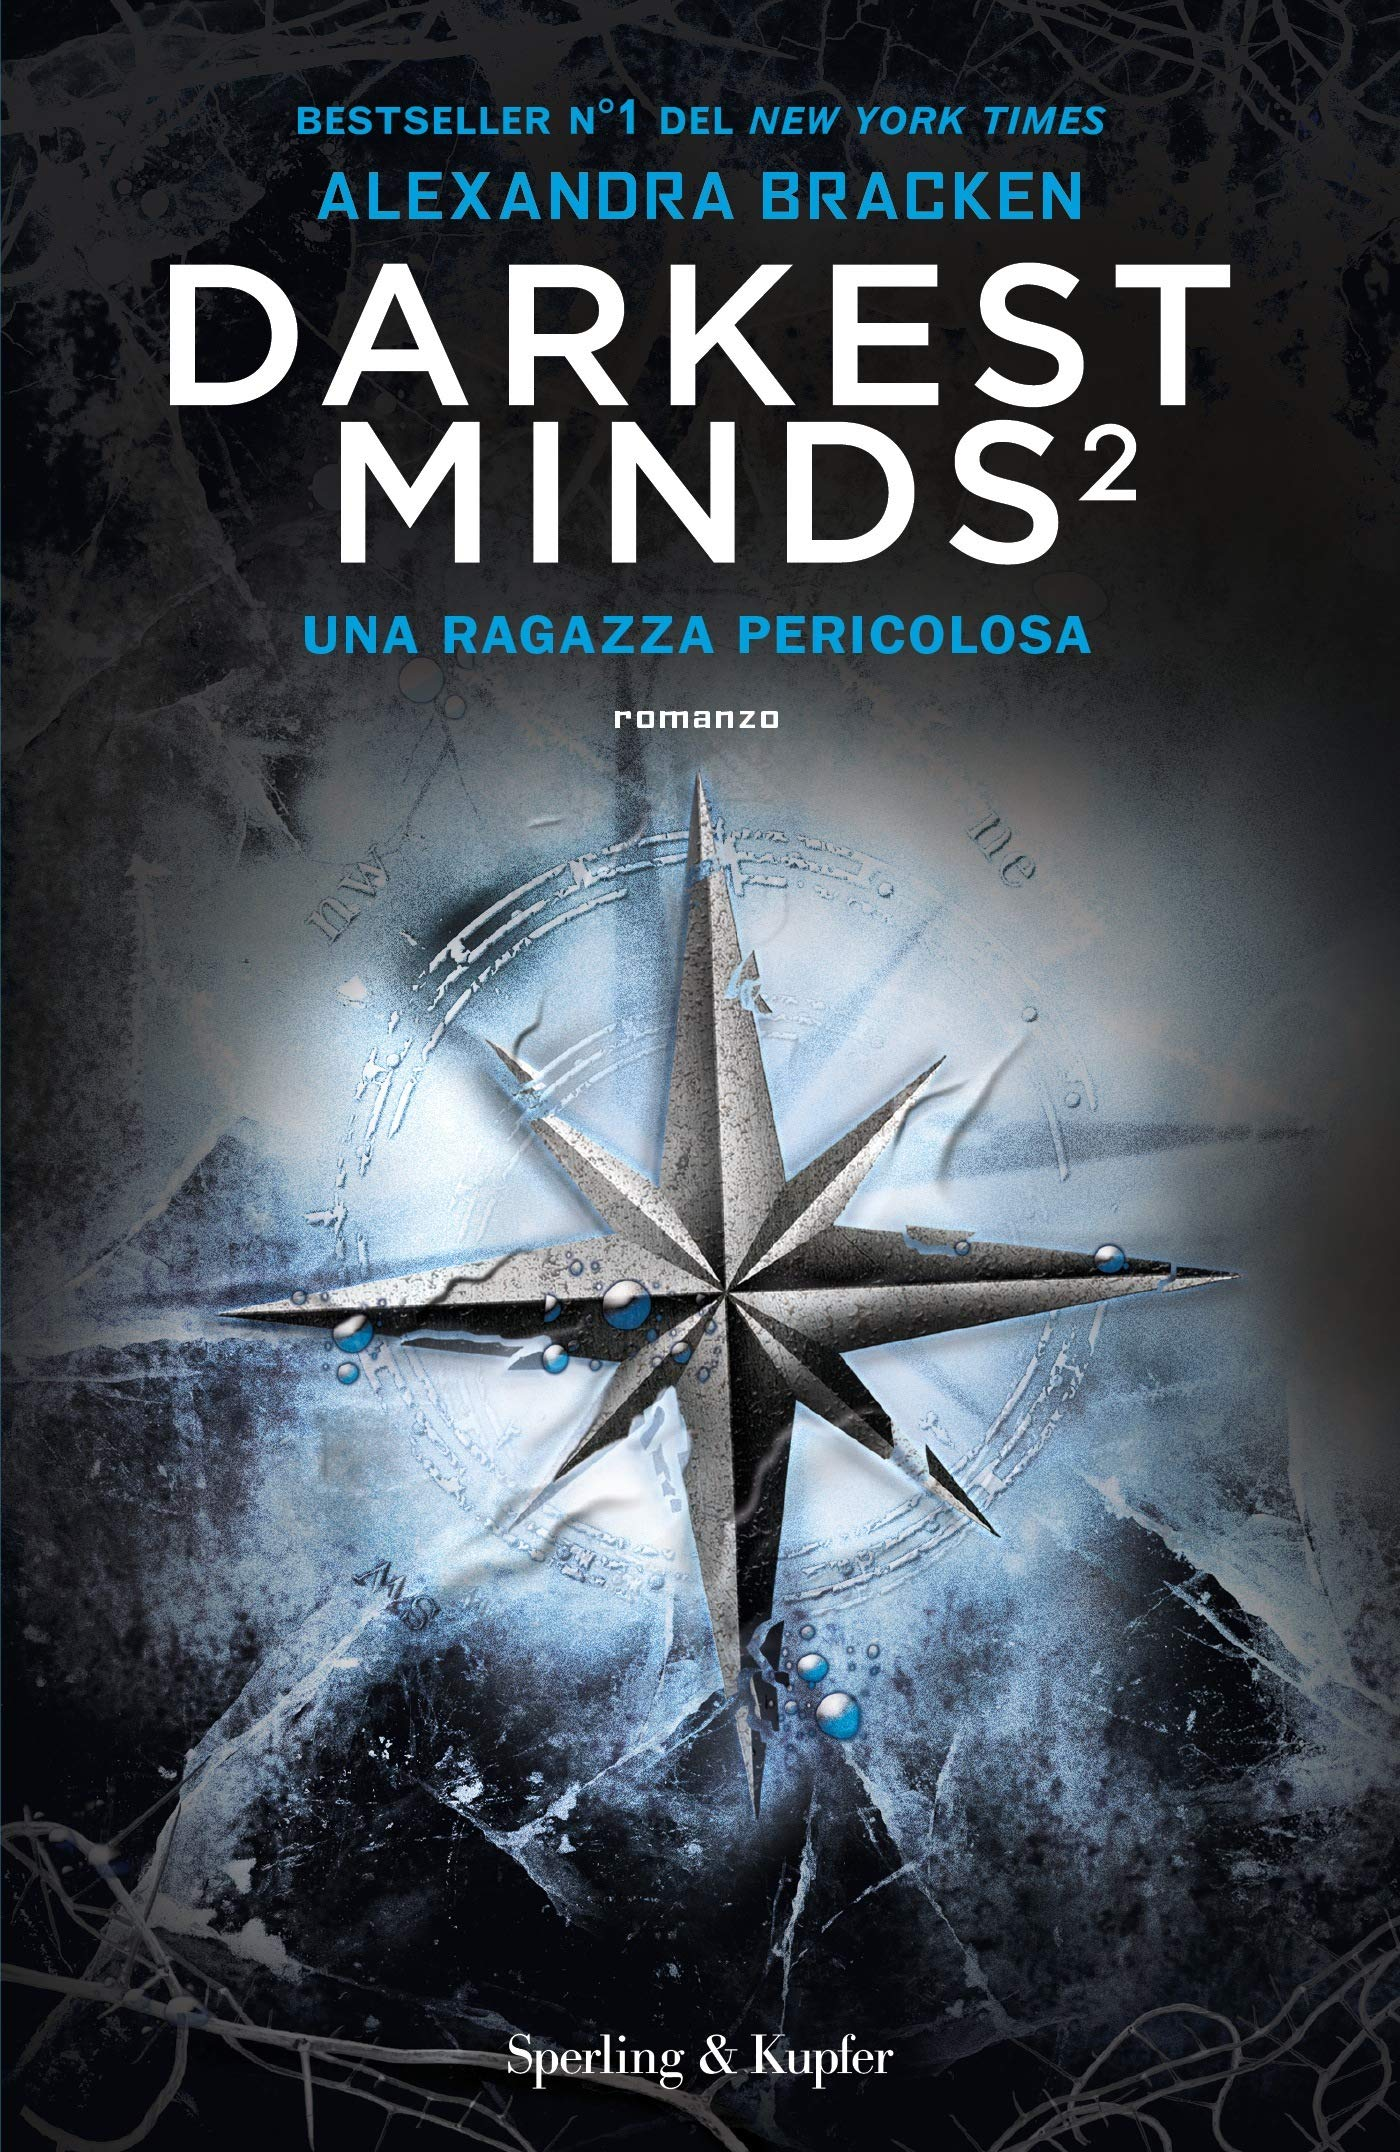 Darkest minds: 2 Copertina rigida – 30 ott 2018 Alexandra Bracken Sperling & Kupfer 8820066572 Fantascienza-fantasy